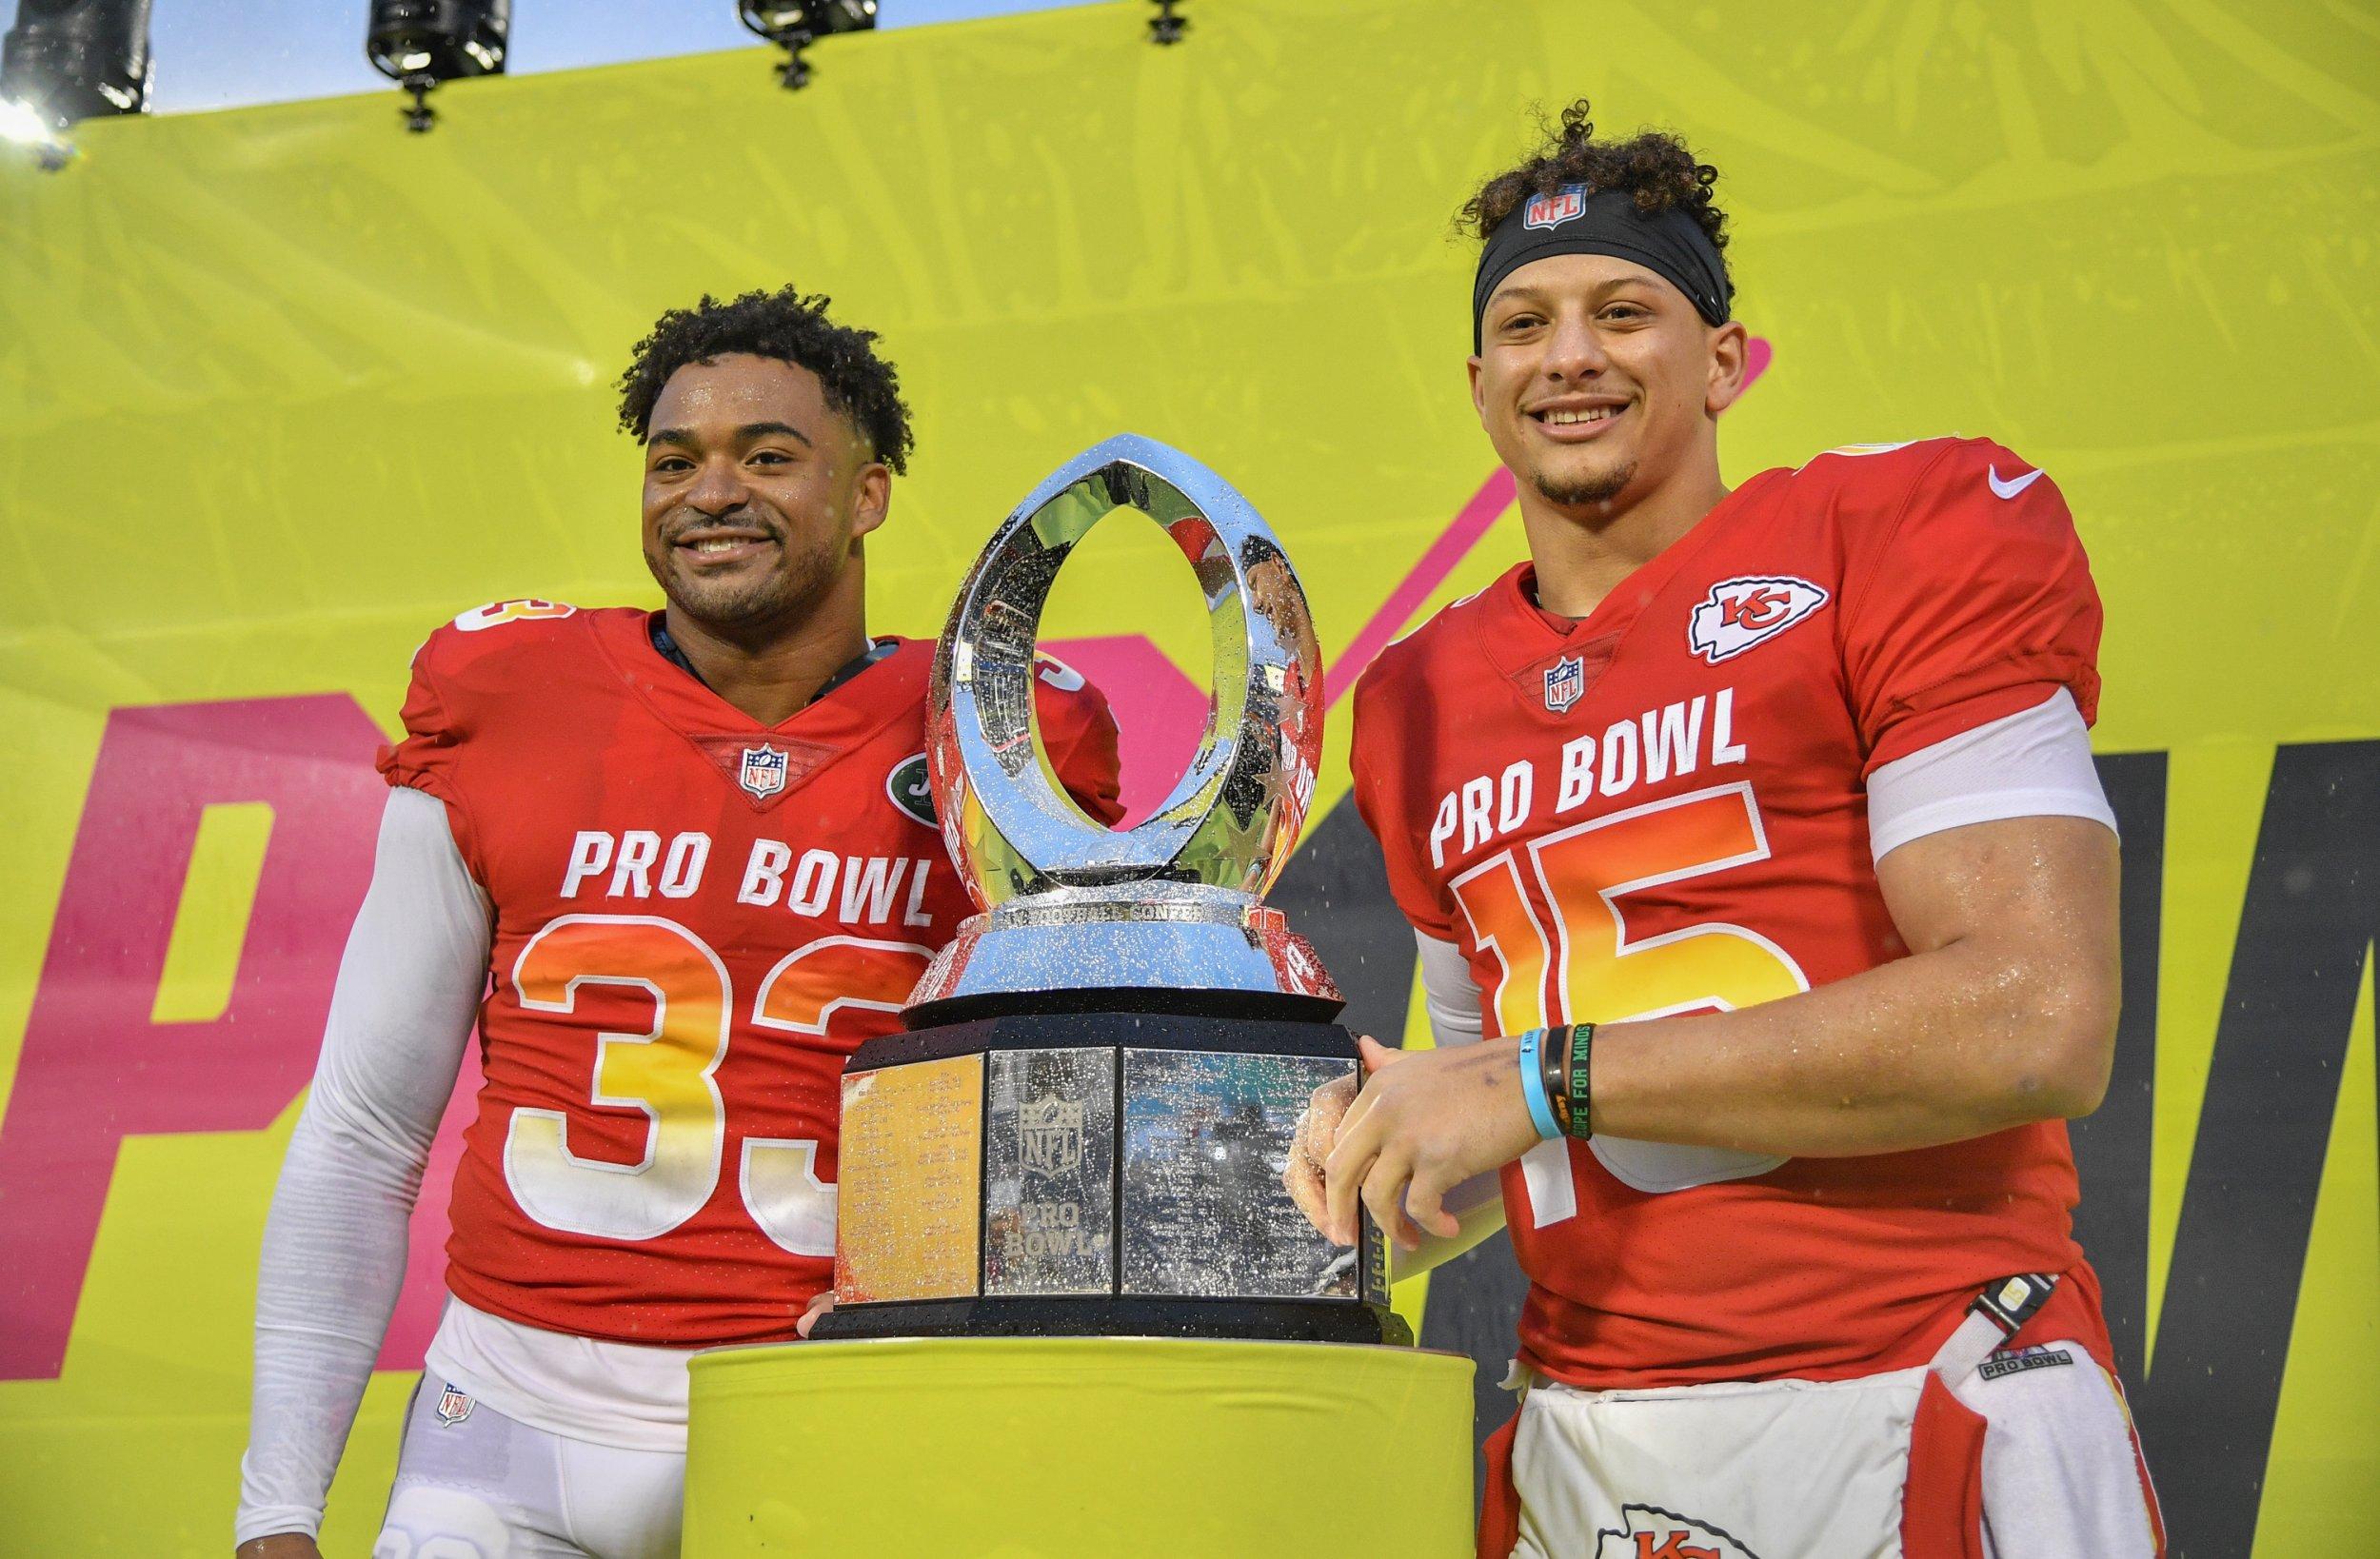 2019 Pro Bowl